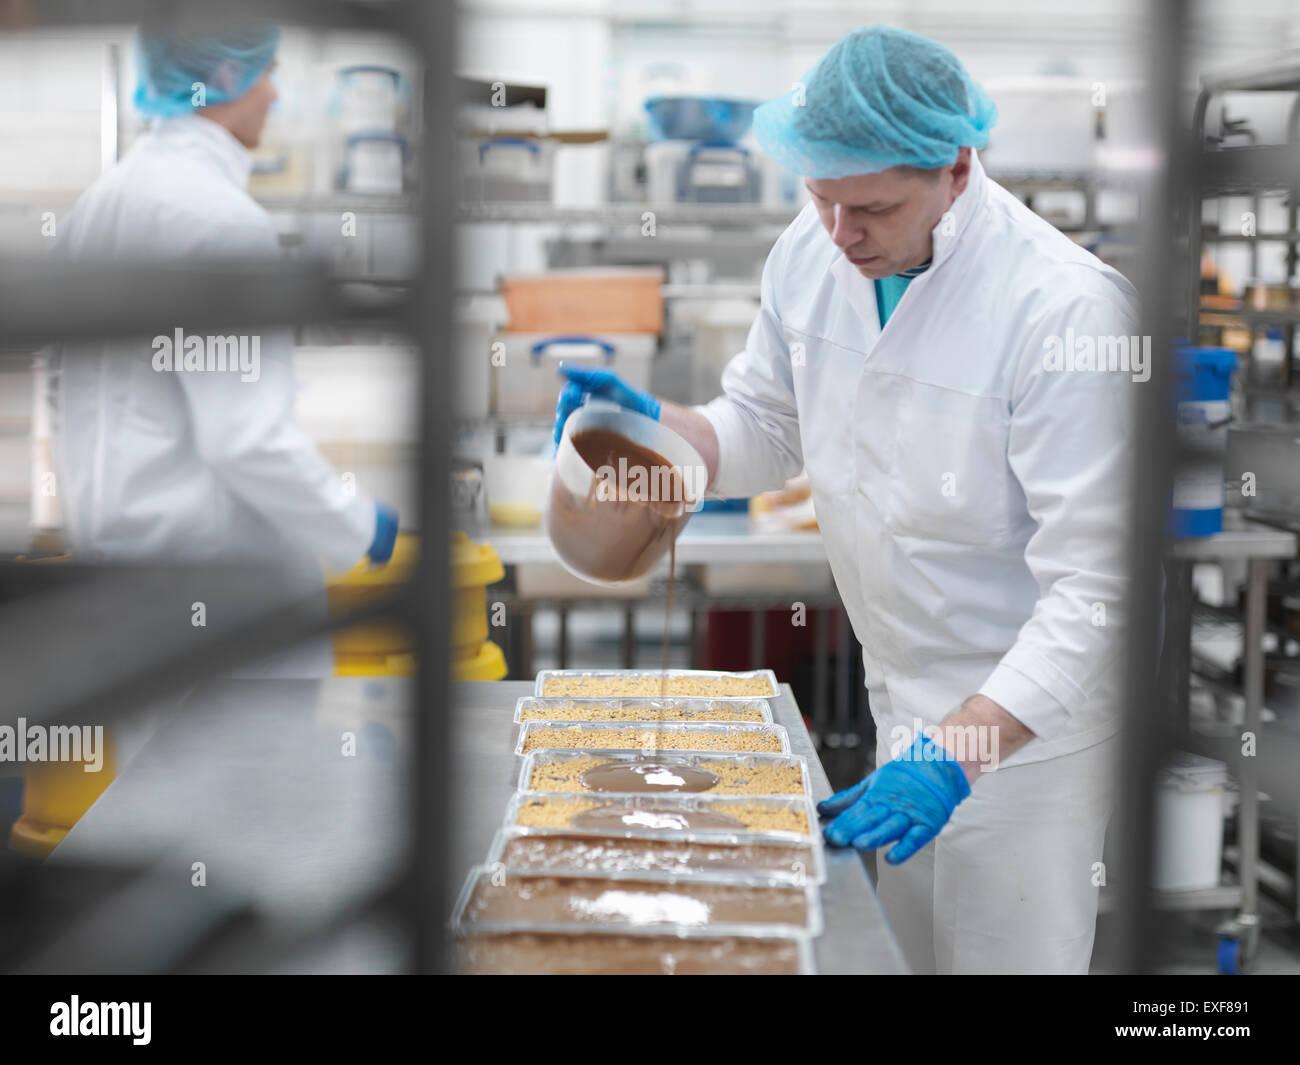 Trabajador masculino verter chocolate cake factory Imagen De Stock